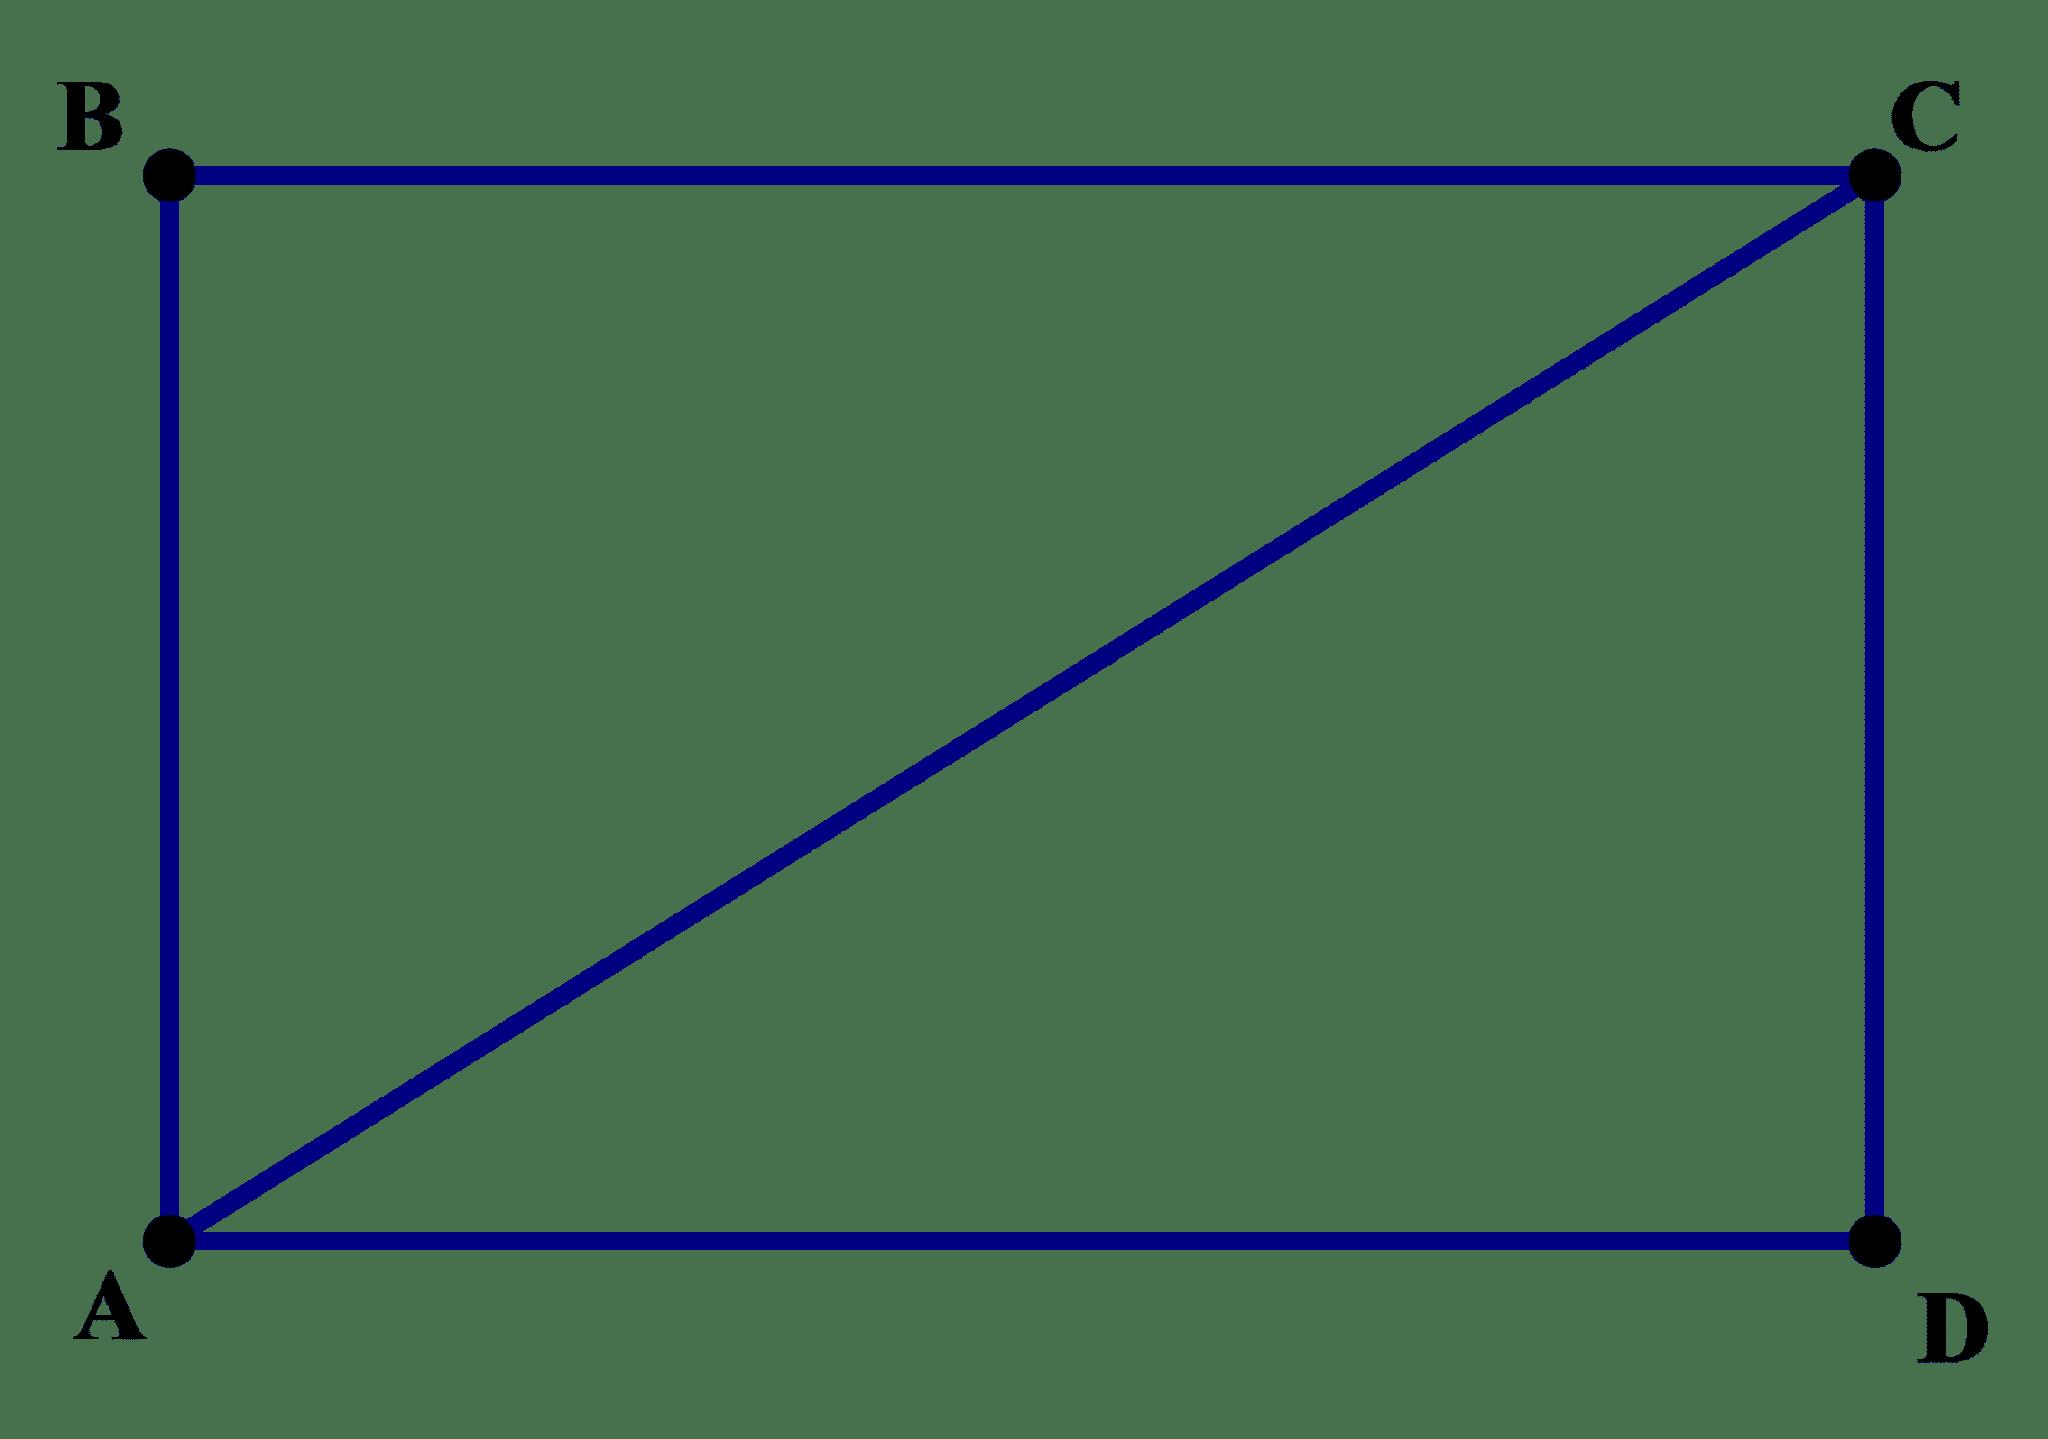 Gre Geometry Diagram Assumptions